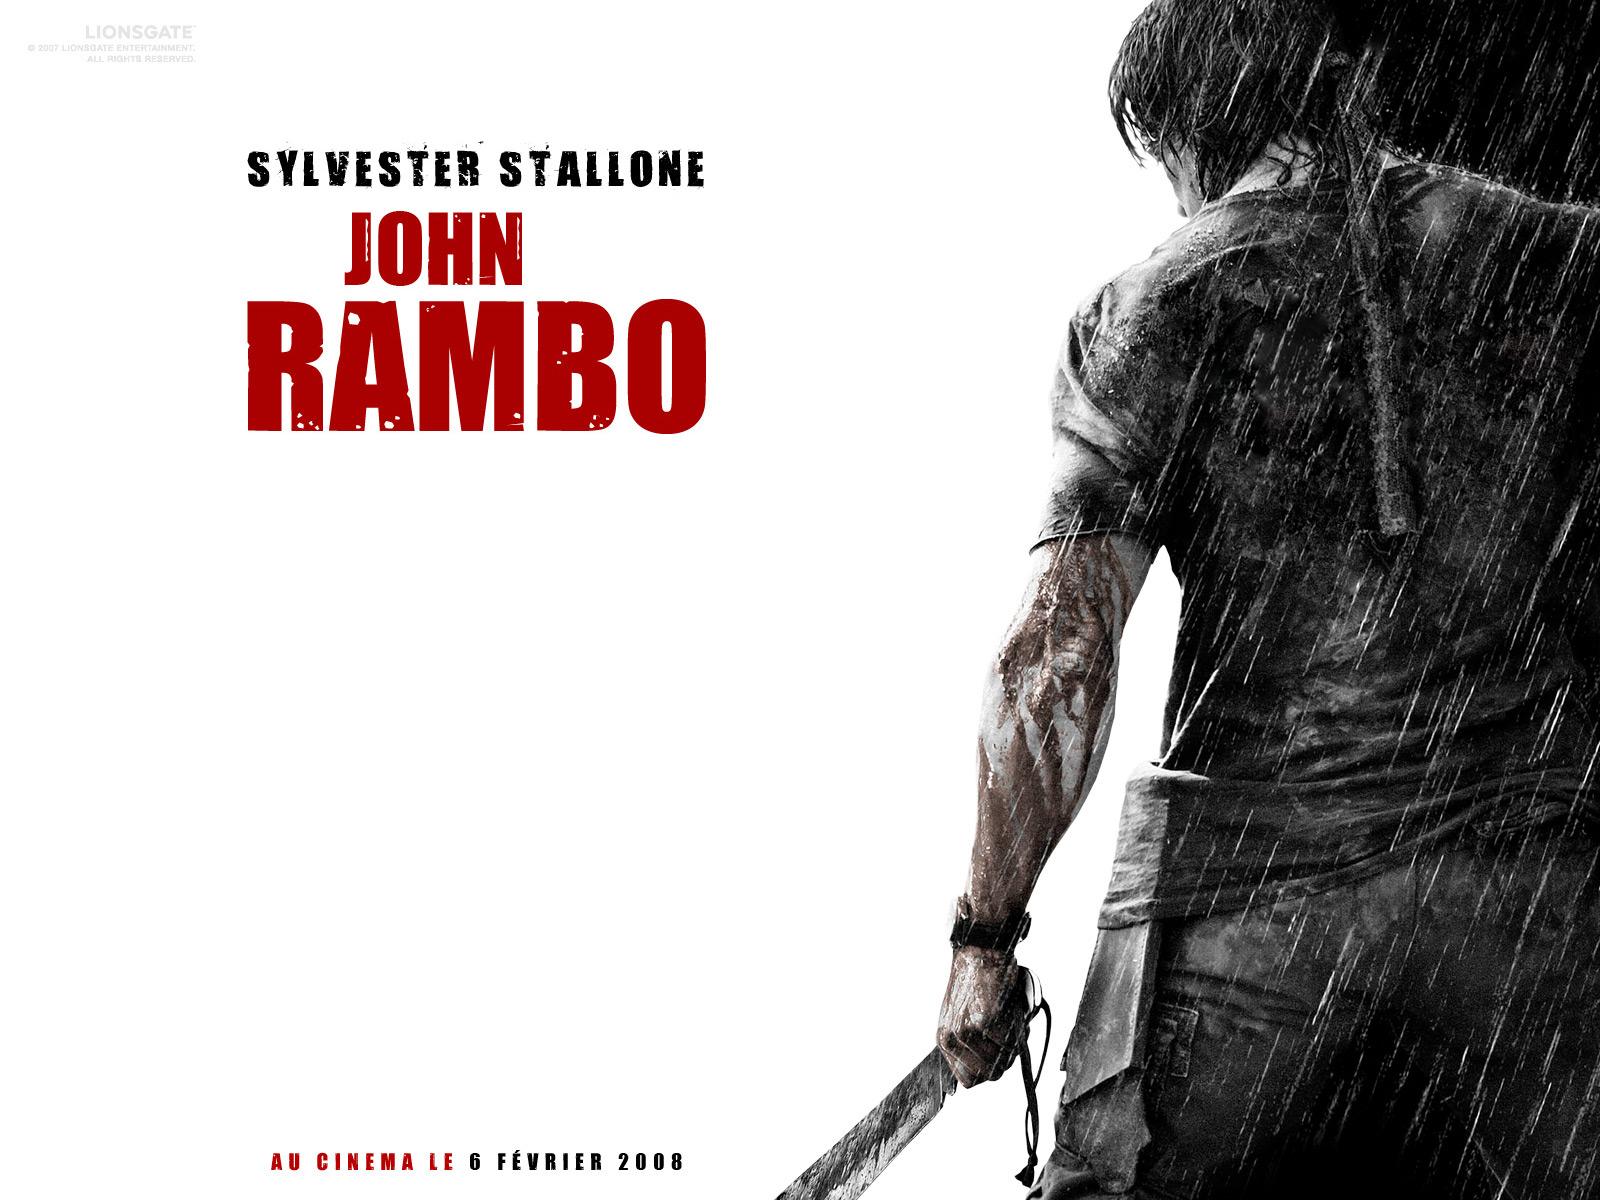 http://3.bp.blogspot.com/-_CC-UYk0NaQ/T5zUgtrSpOI/AAAAAAAABeo/jUCXxVpSKyo/s1600/Rambo+4+-+2.jpg